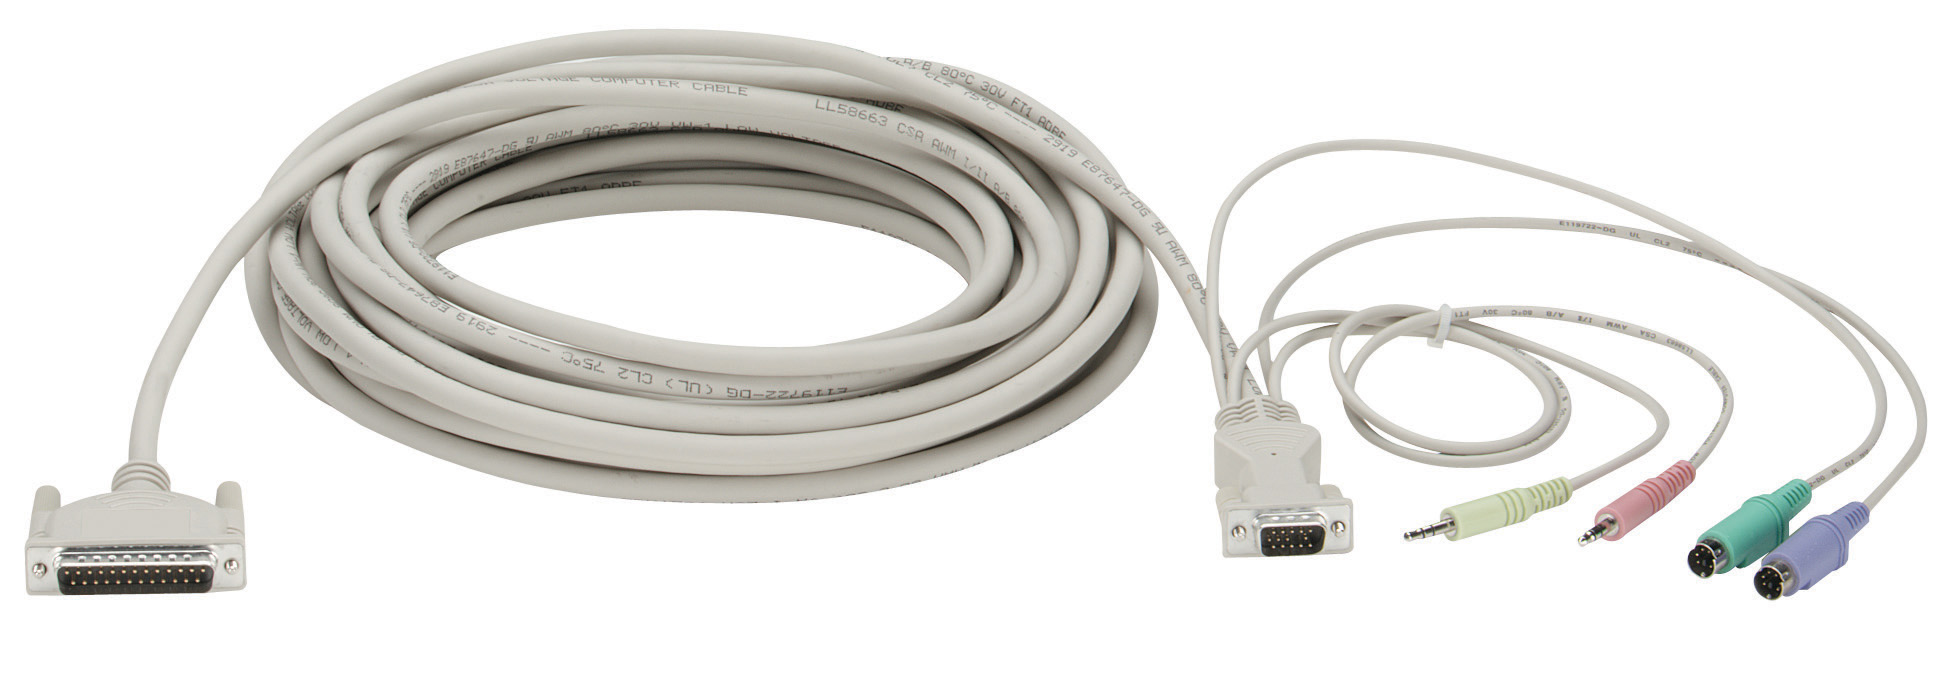 5FT KVM CPU Cable VGA PS2 With Audio | Black Box